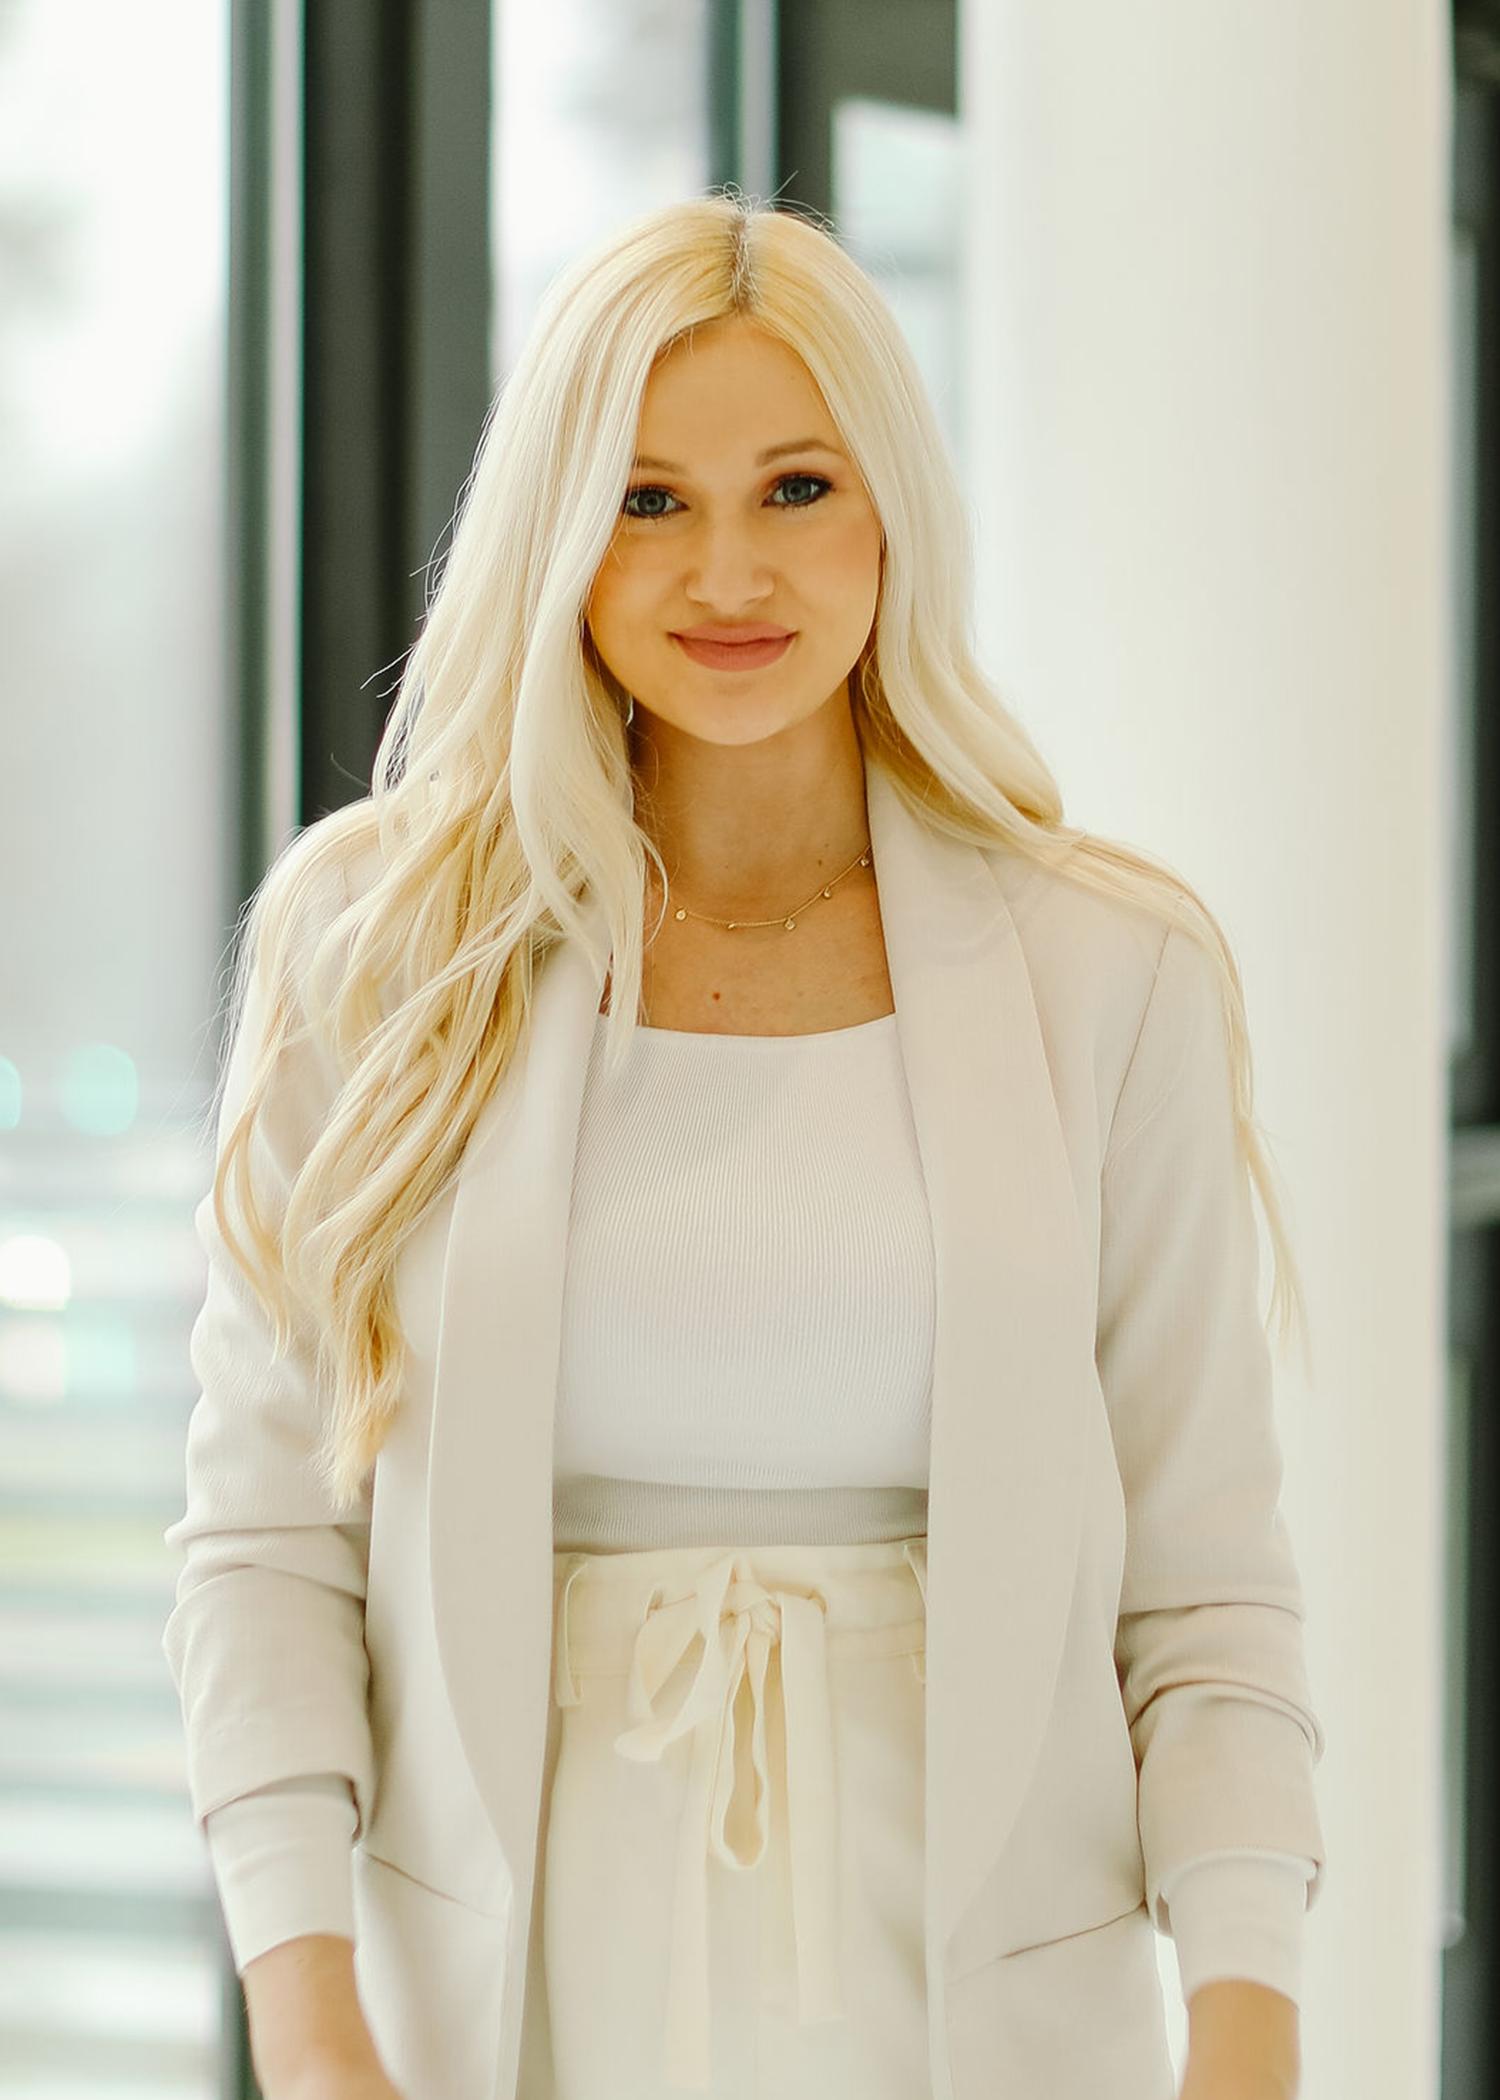 Kristina Coughlin